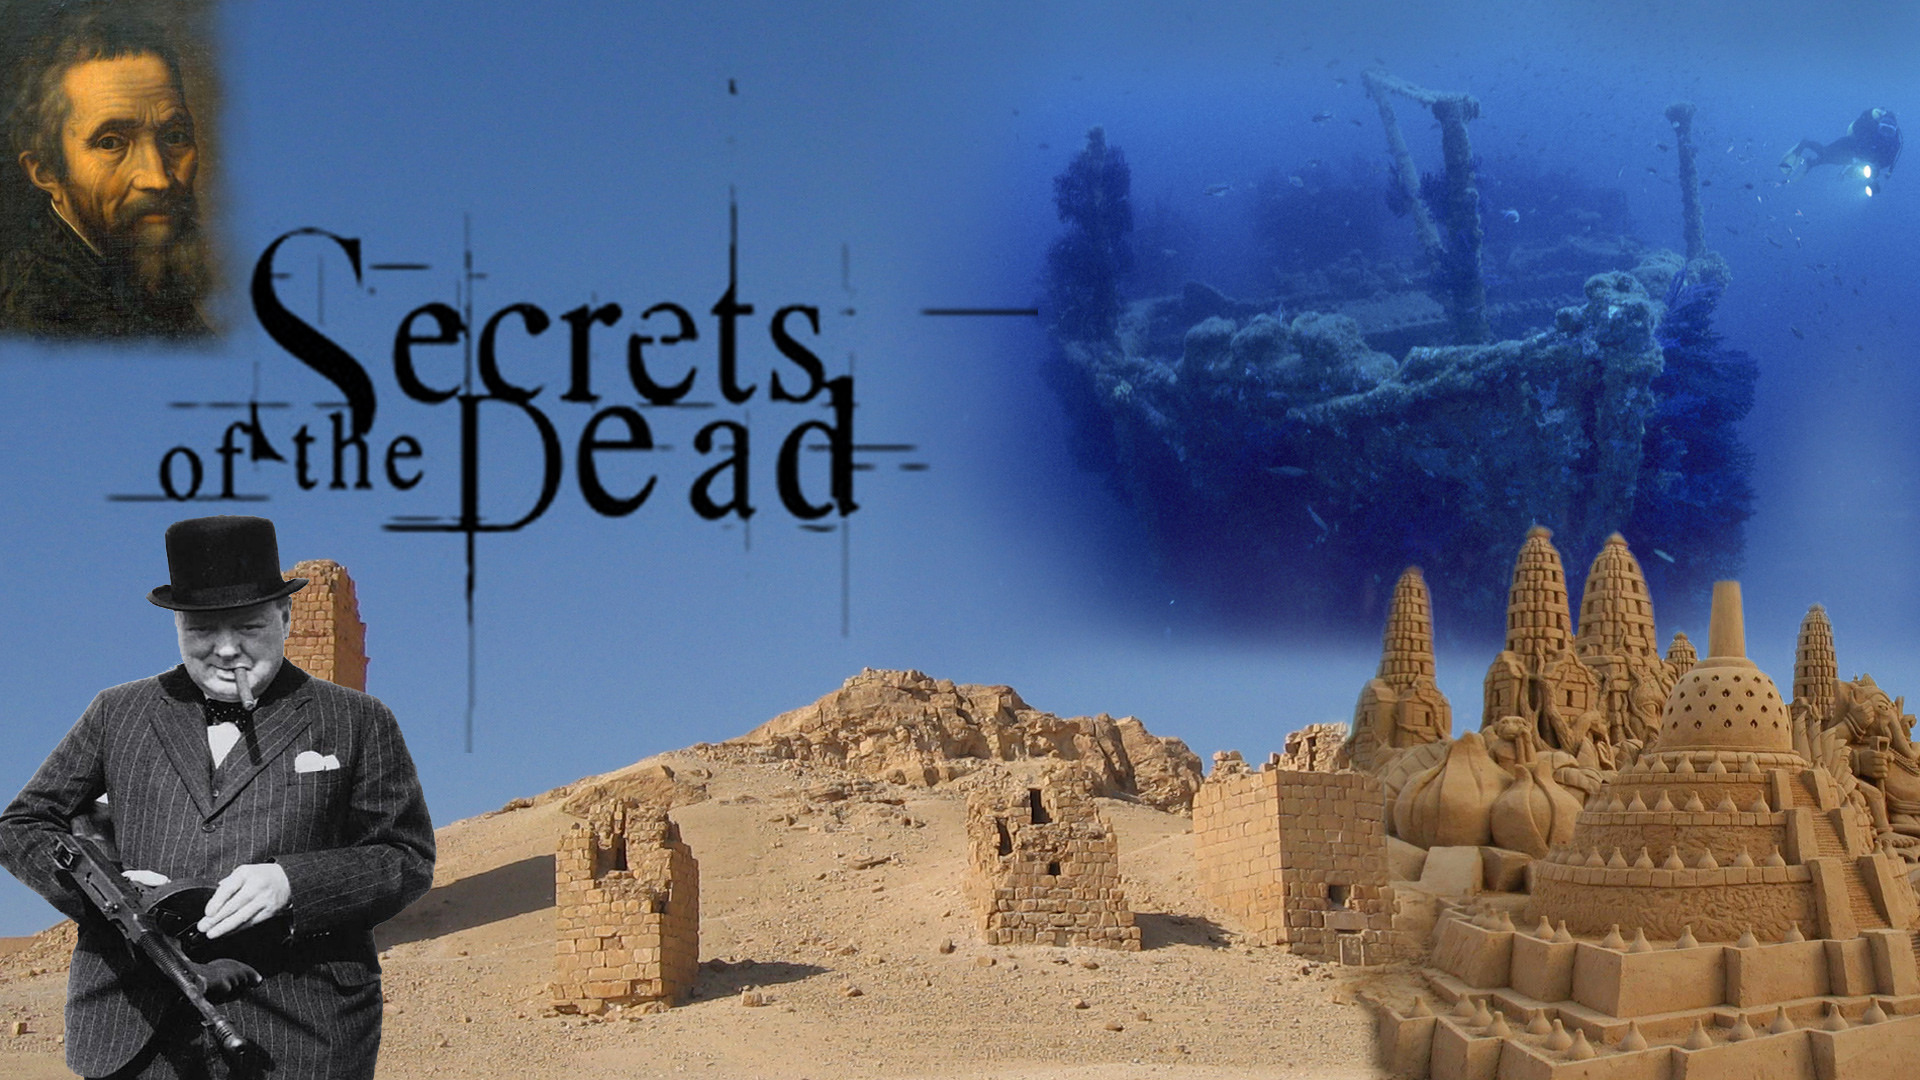 Show Secrets of the Dead